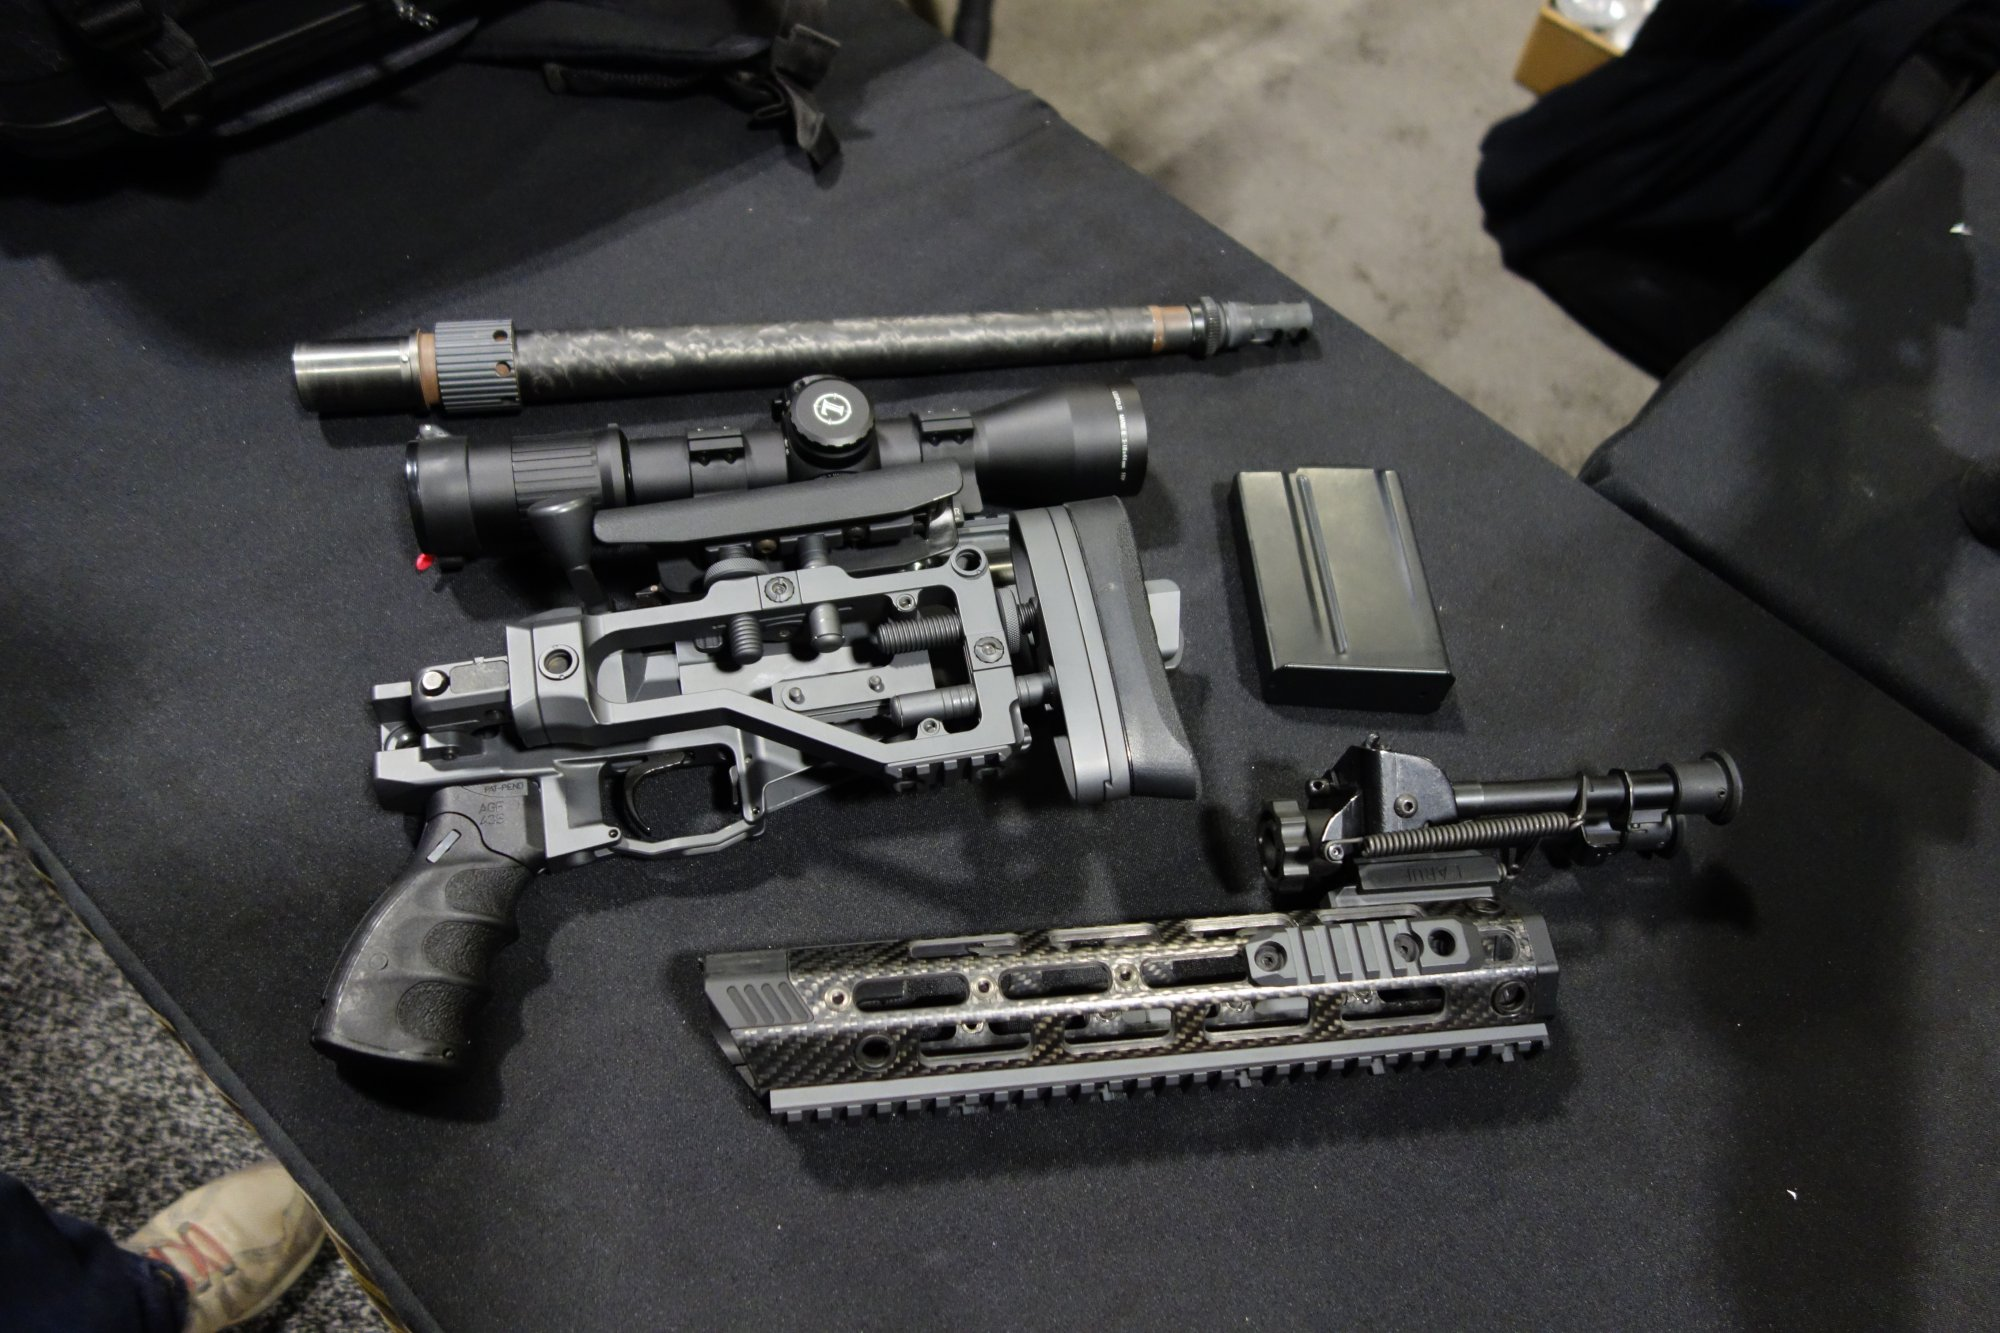 Remington_Defense_CSR_Concealable_Sniper